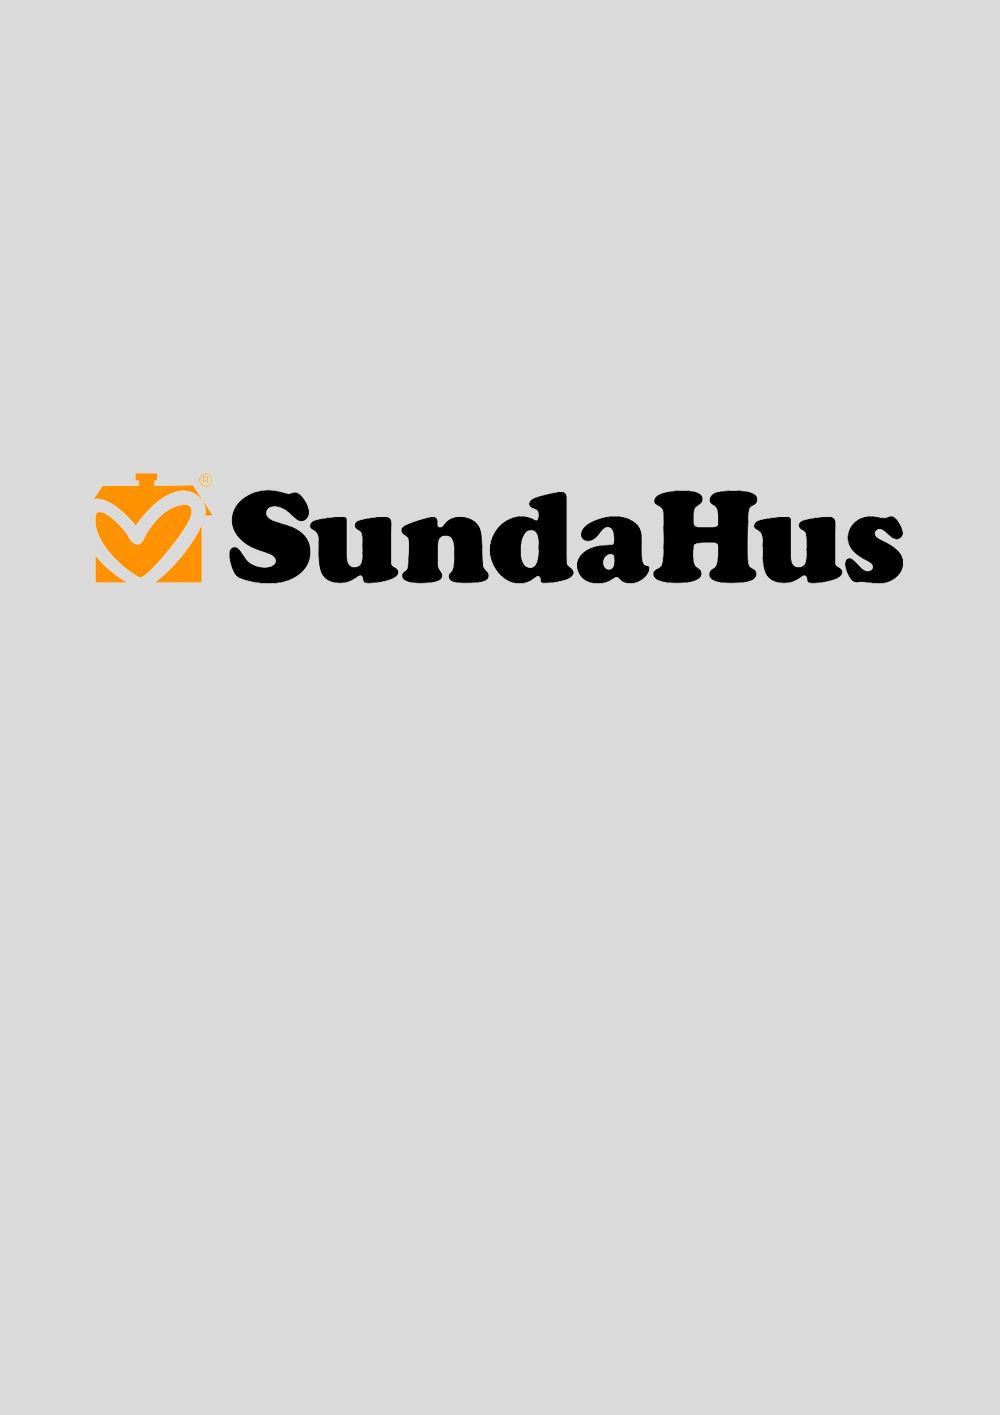 Sunda Hus - Dala Sten